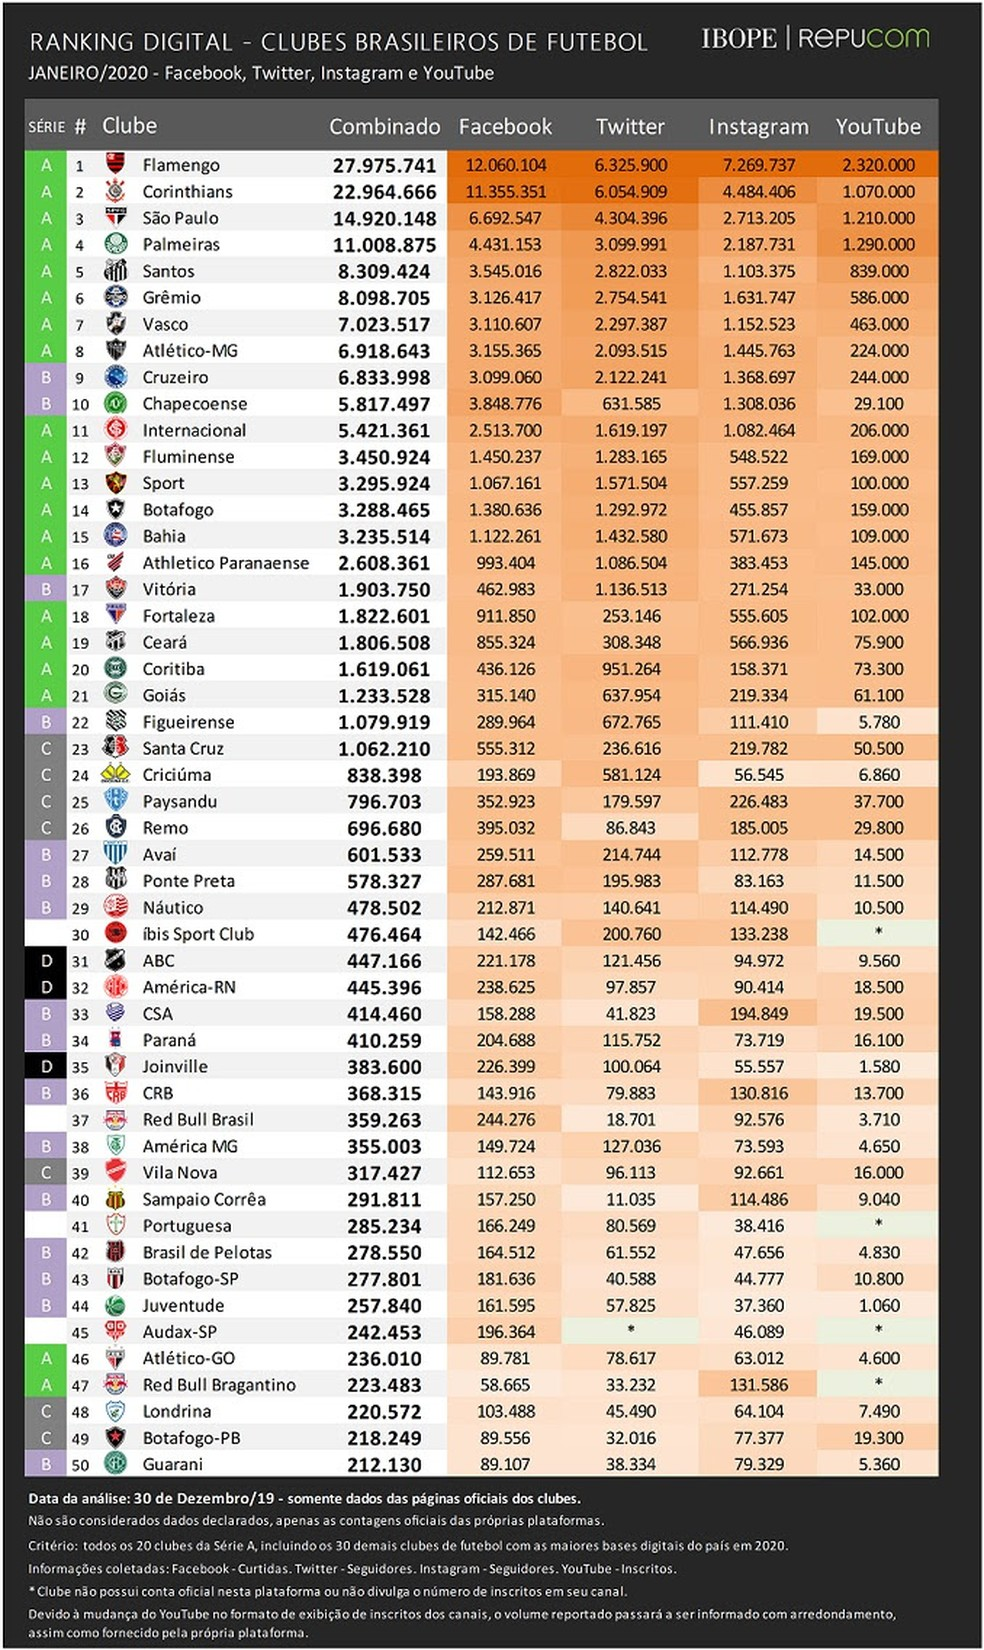 Ranking digital de clubes brasileiros 2019 — Foto: Ibope/Repucom